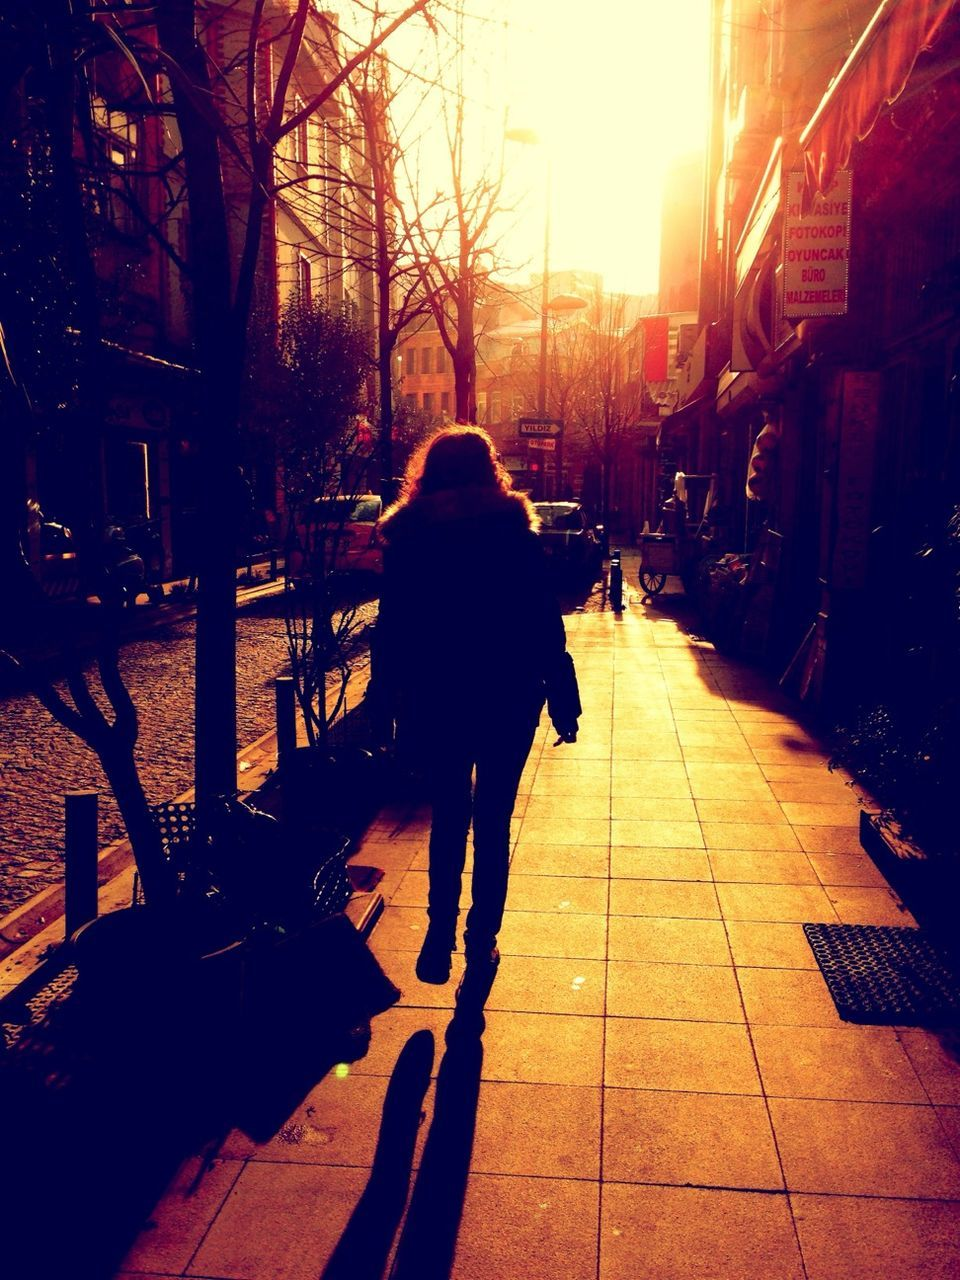 Rear View Of Woman Walking On Sidewalk During Sunset